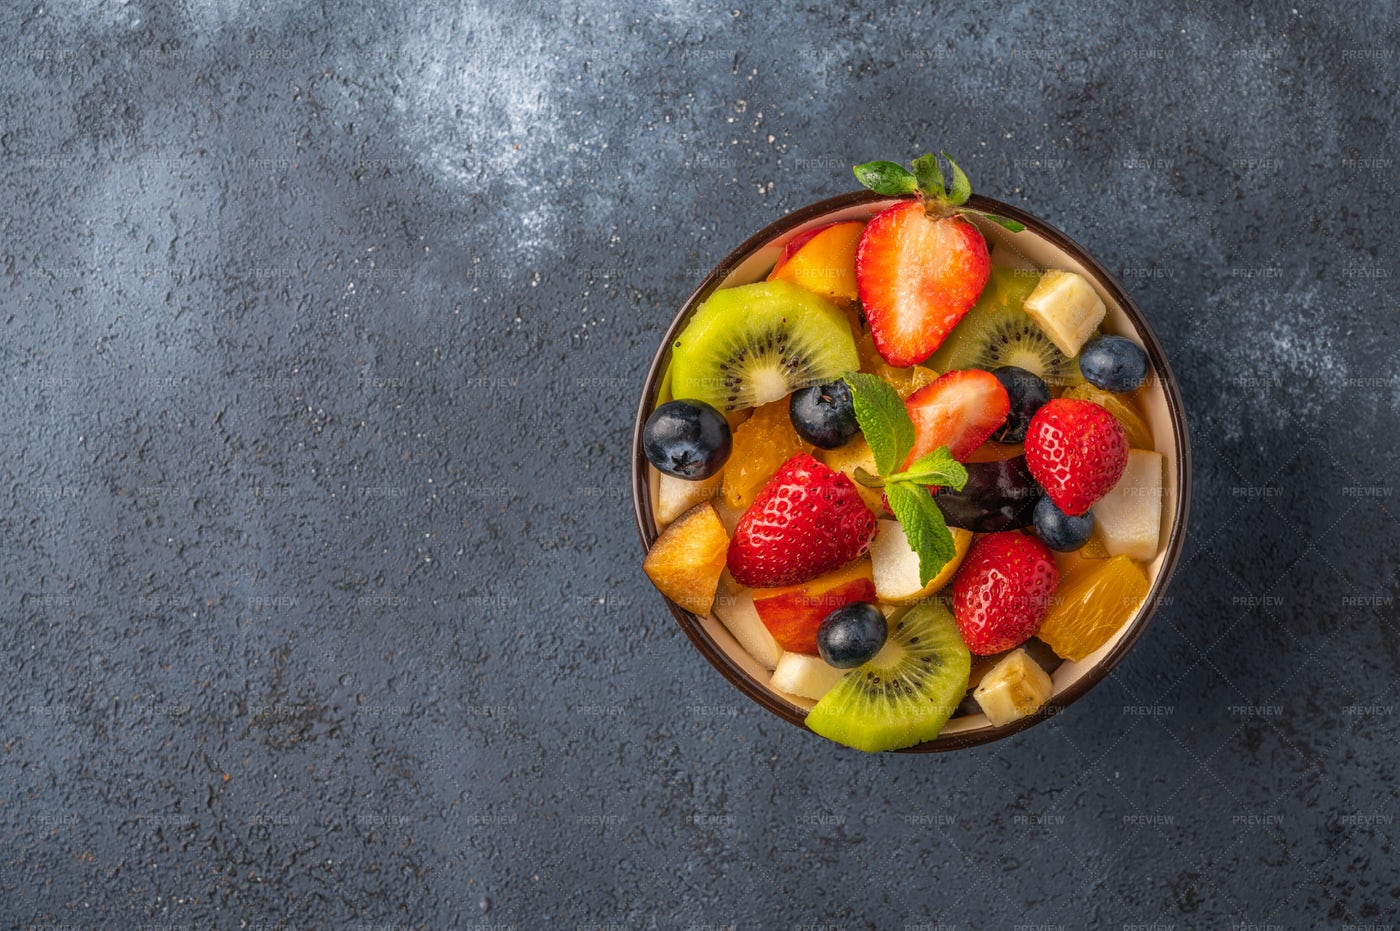 Fruit Salad On Dark Background: Stock Photos